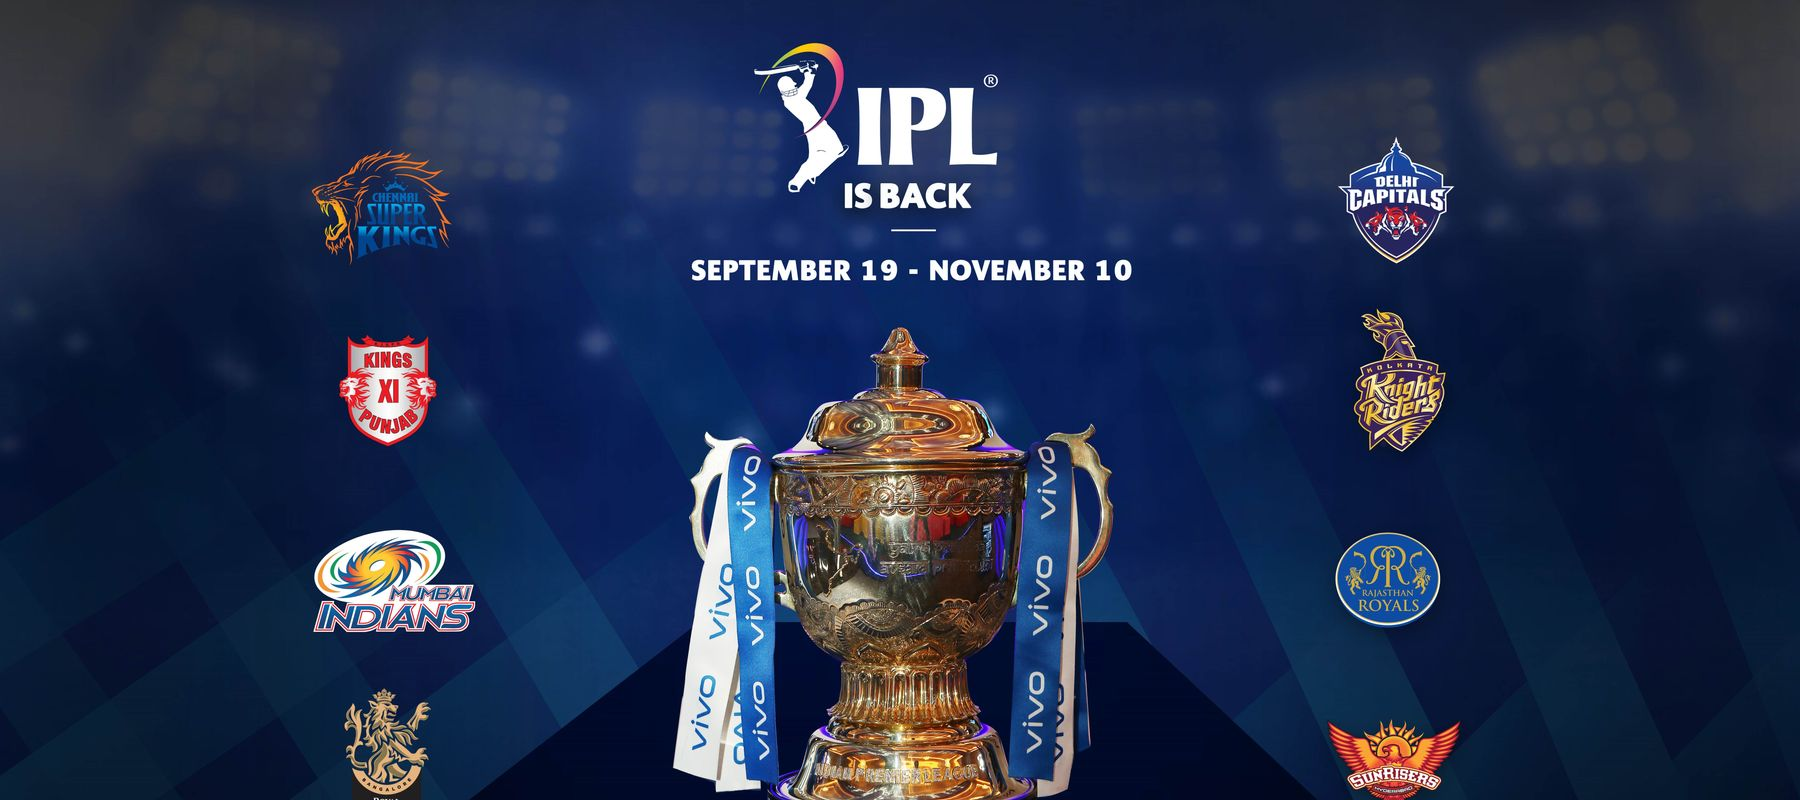 IPL 2020 schedule squads live streming